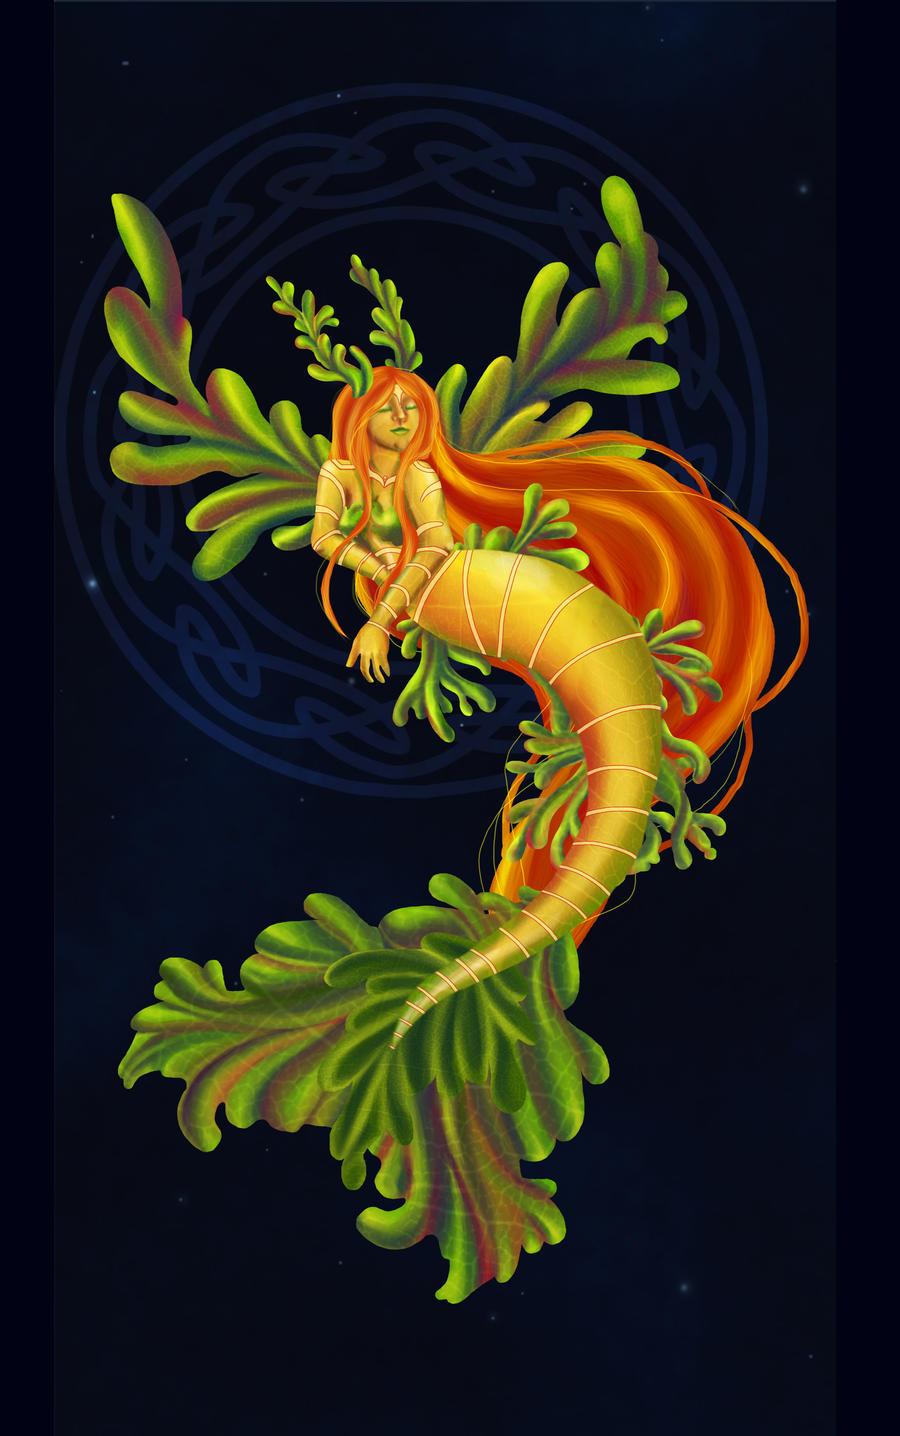 Leafy Sea Dragon Mermaid by Tiny-Owl on DeviantArt